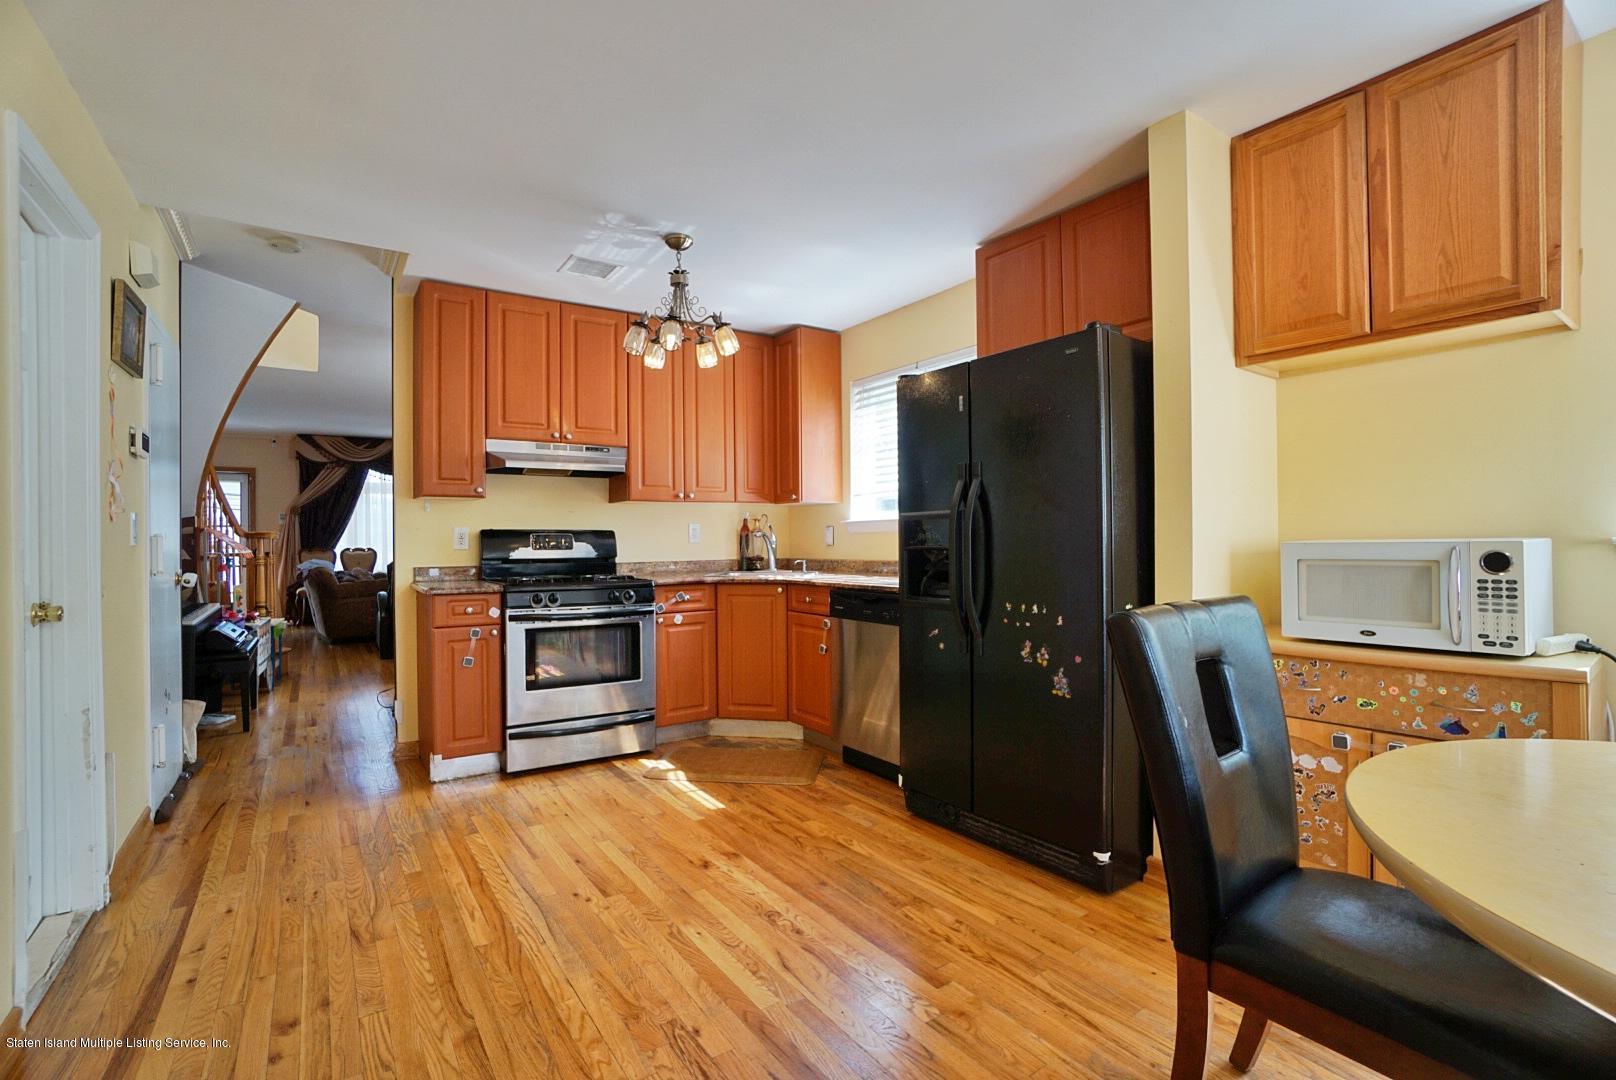 Single Family - Semi-Attached 36 Zwicky Avenue  Staten Island, NY 10306, MLS-1131911-5